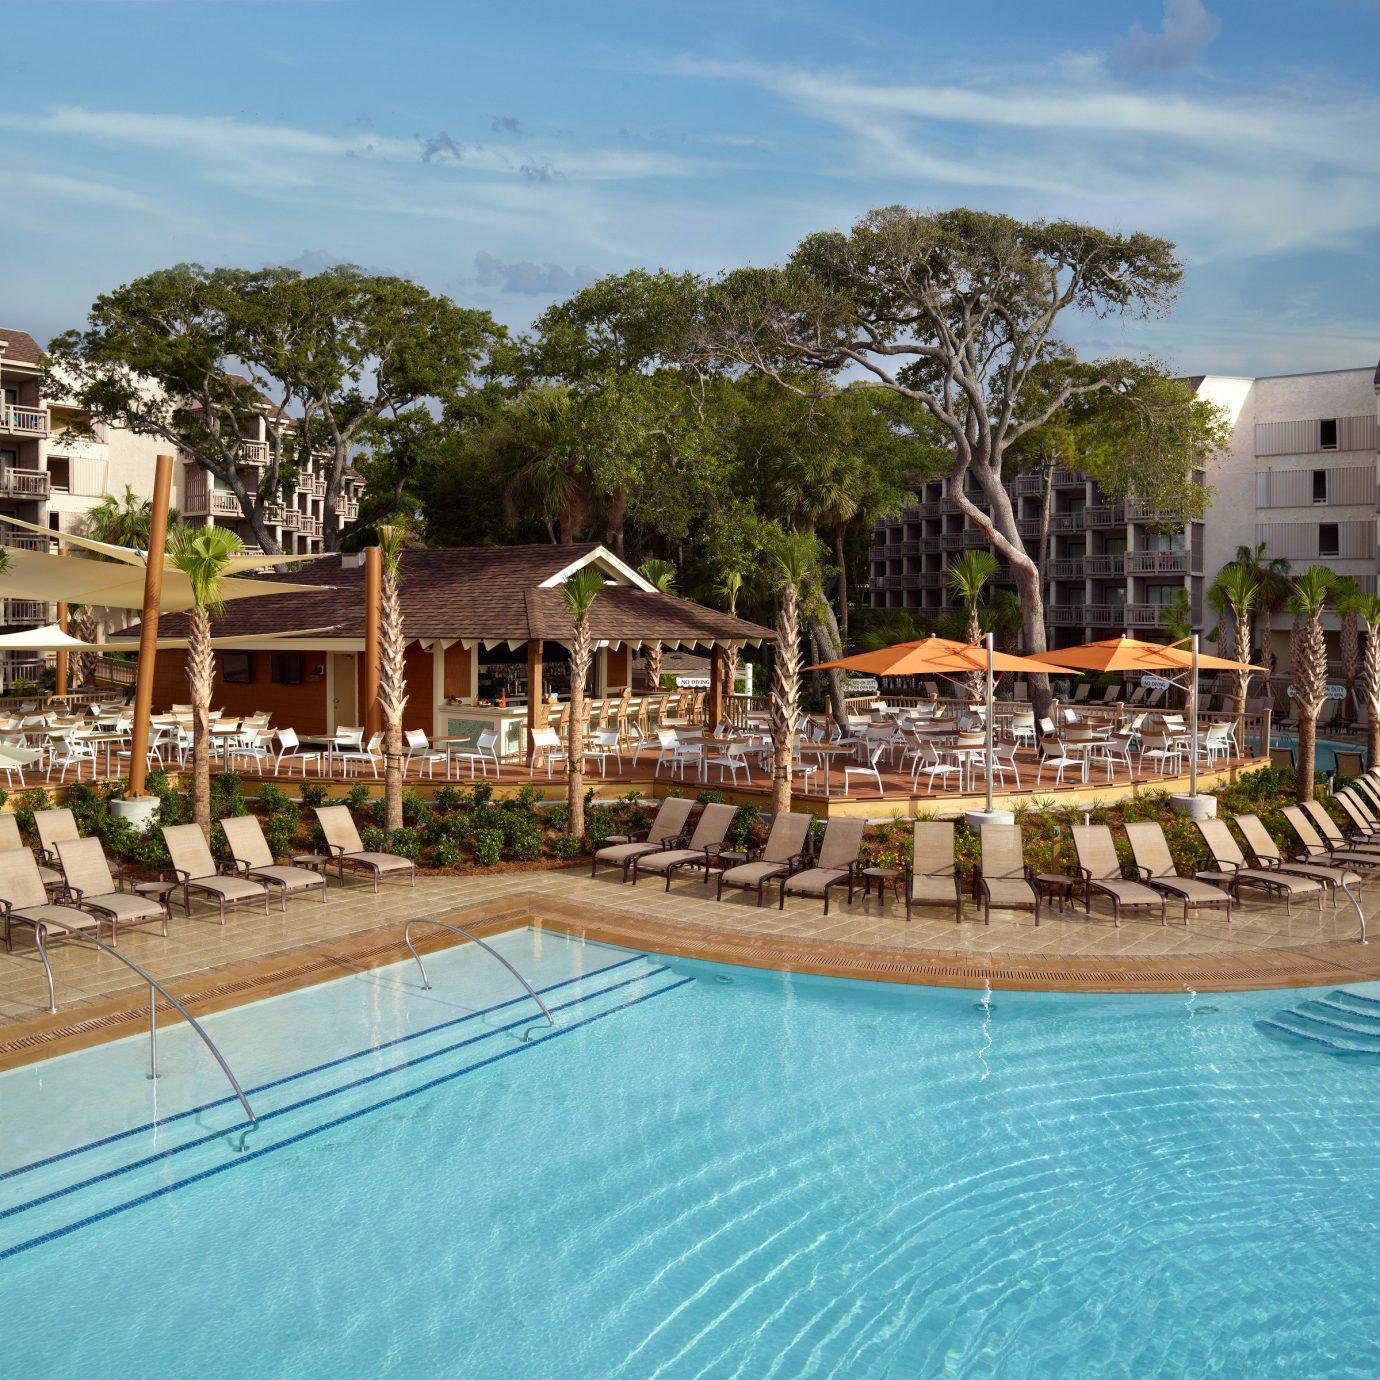 sky swimming pool leisure property Resort Pool condominium plaza resort town palace marina Water park swimming lined